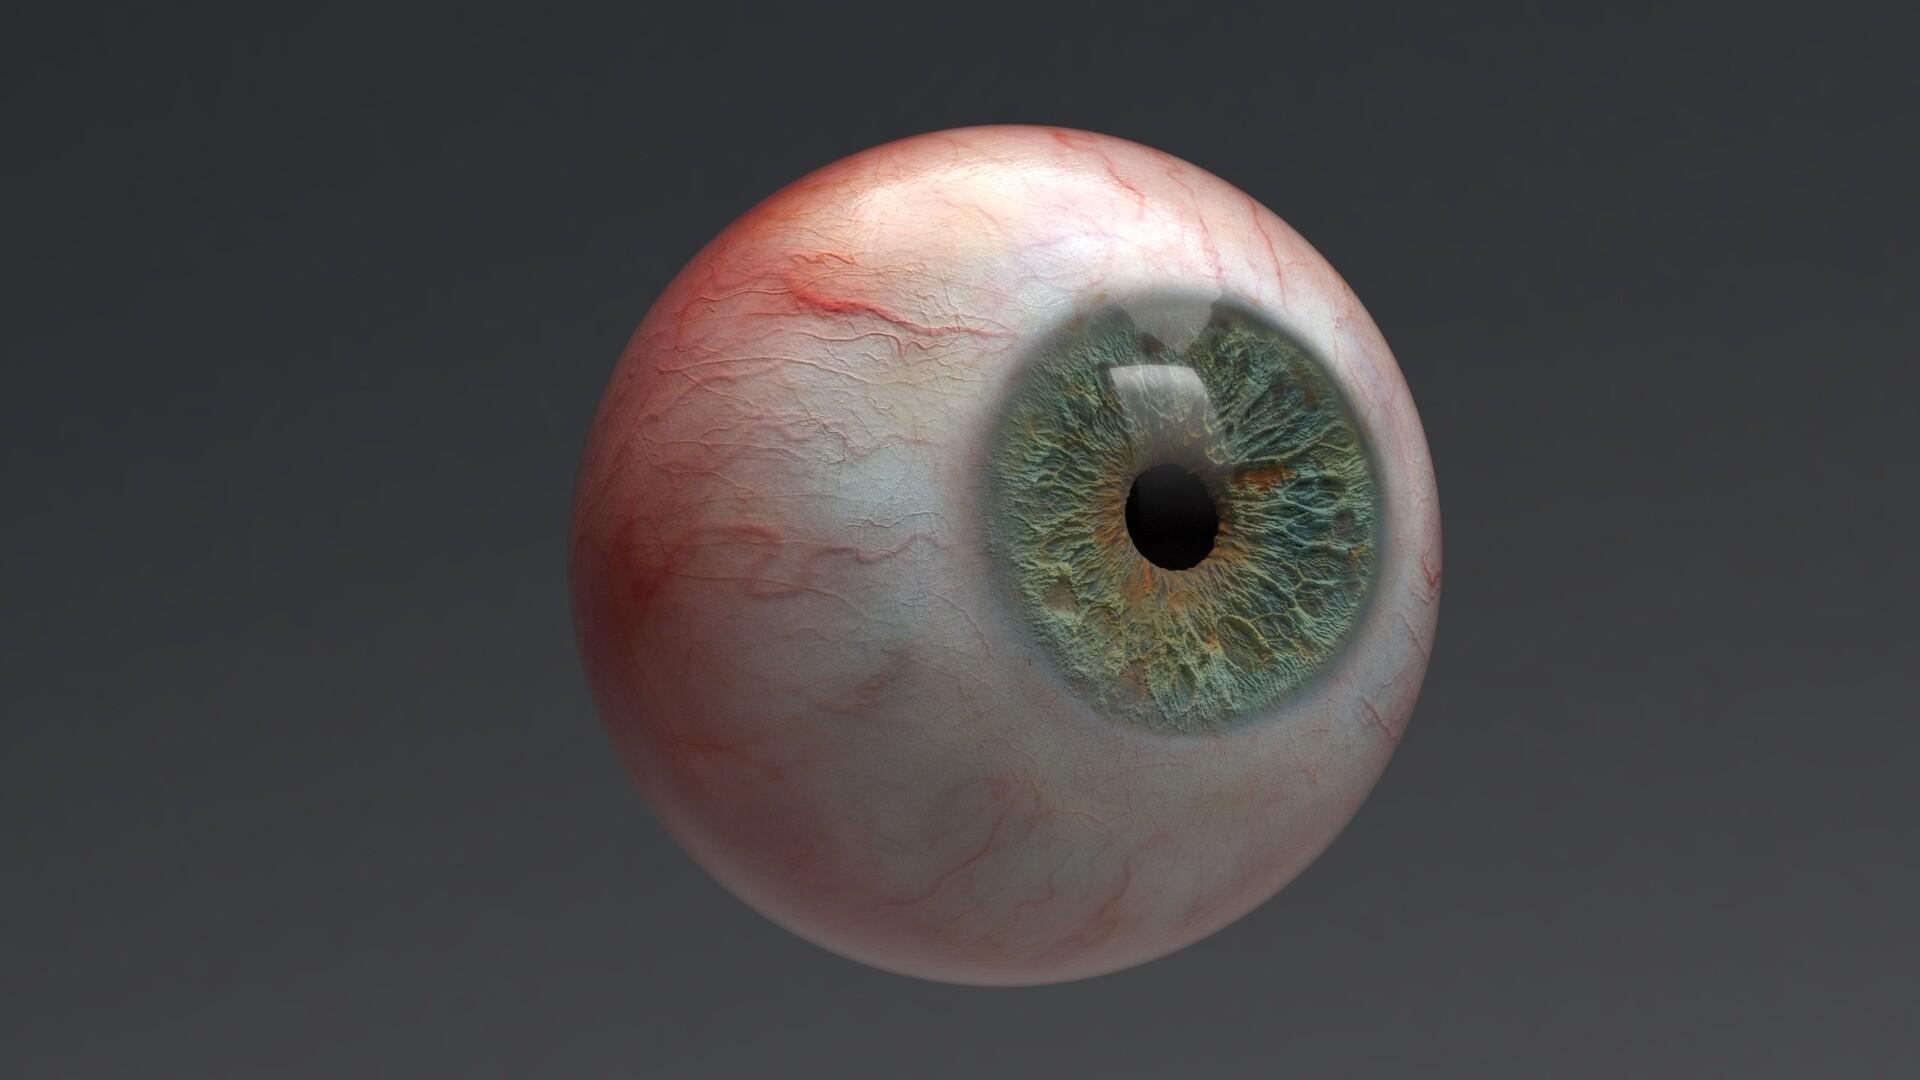 Chingiz jumagulov eye version2 002